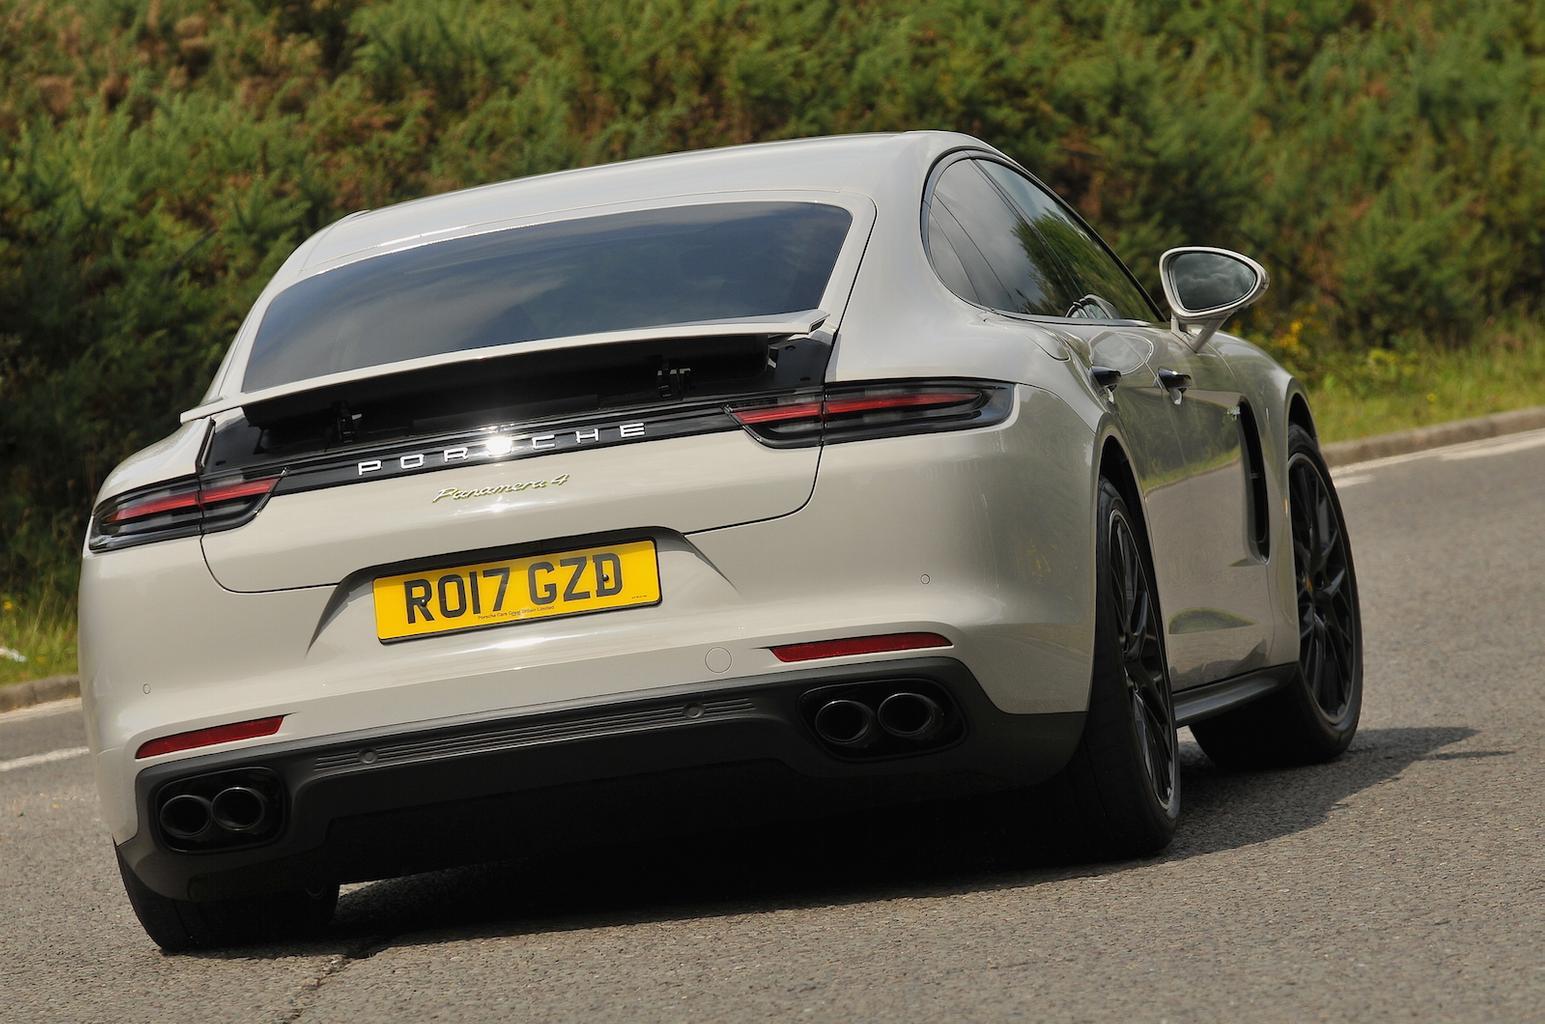 2017 Porsche Panamera 4 E-Hybrid review – price, specs and release date